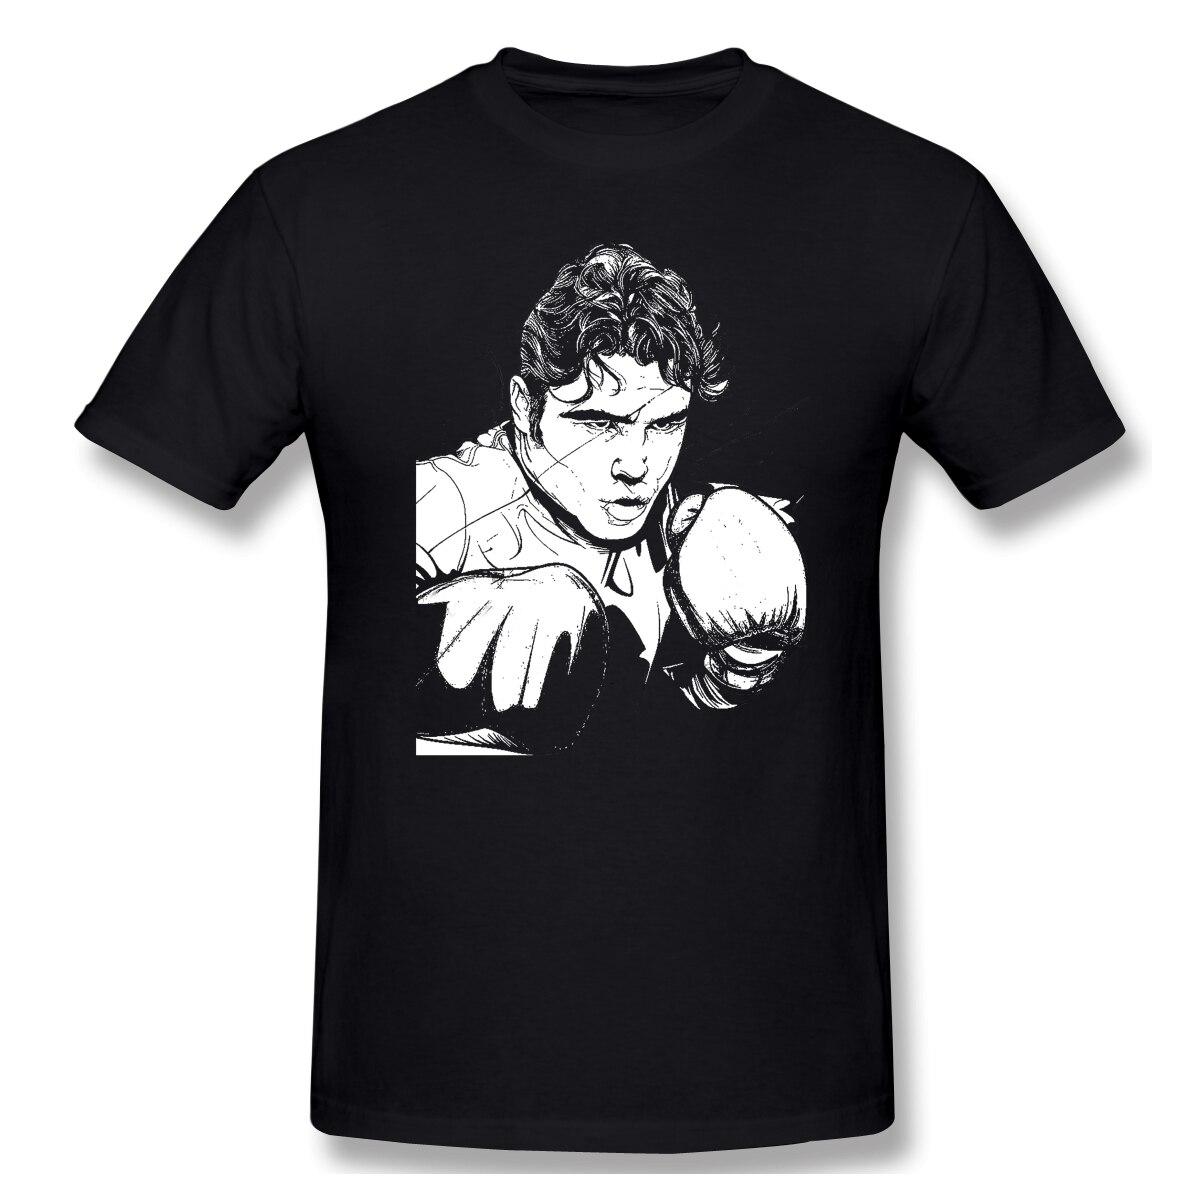 Canelos Alvarez Essentialc3 hombres cortas básicas manga camiseta R257 camisetas tamaño Eur